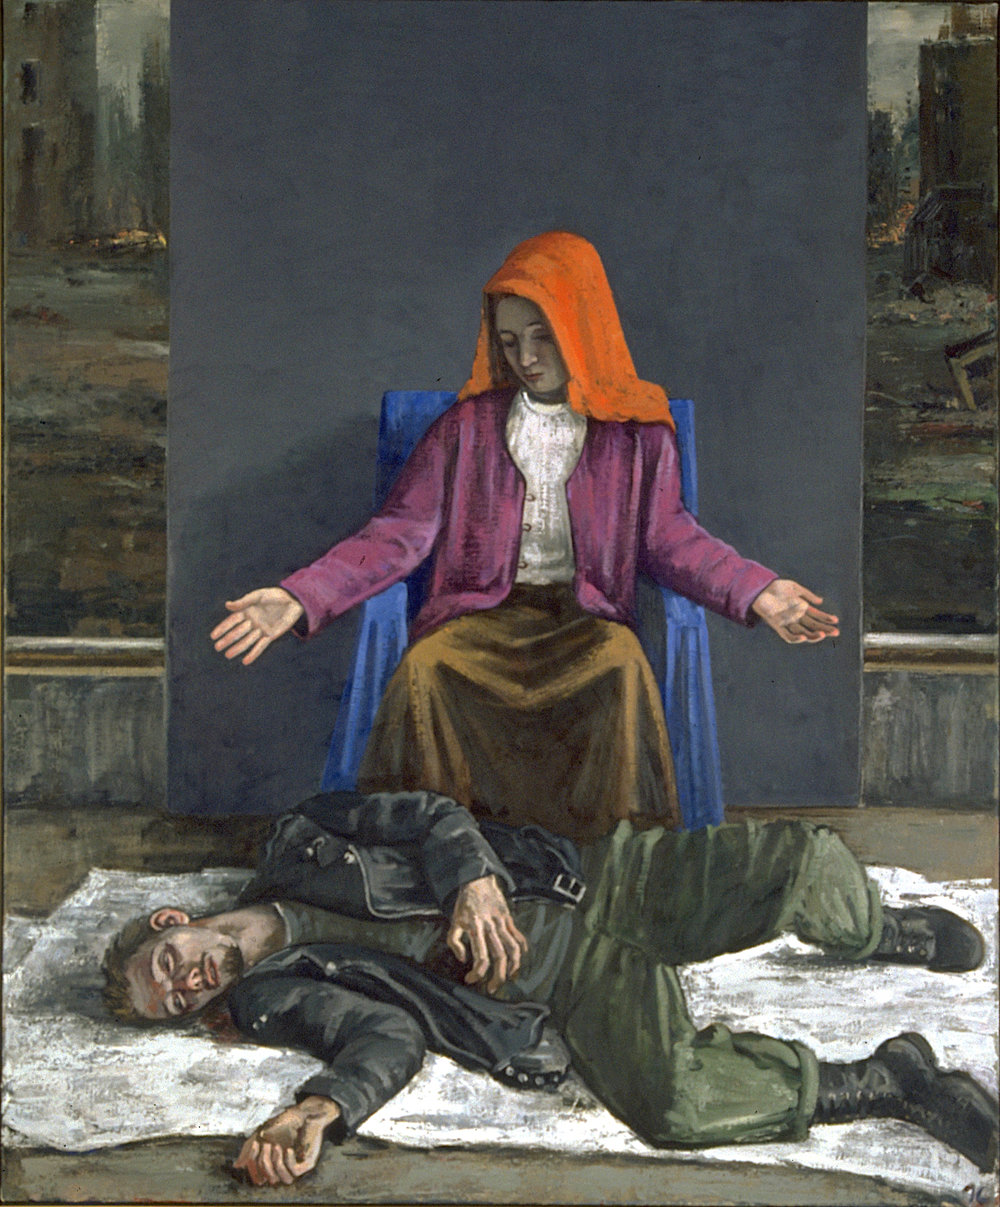 Pieta; St. Mary's. 1990s.